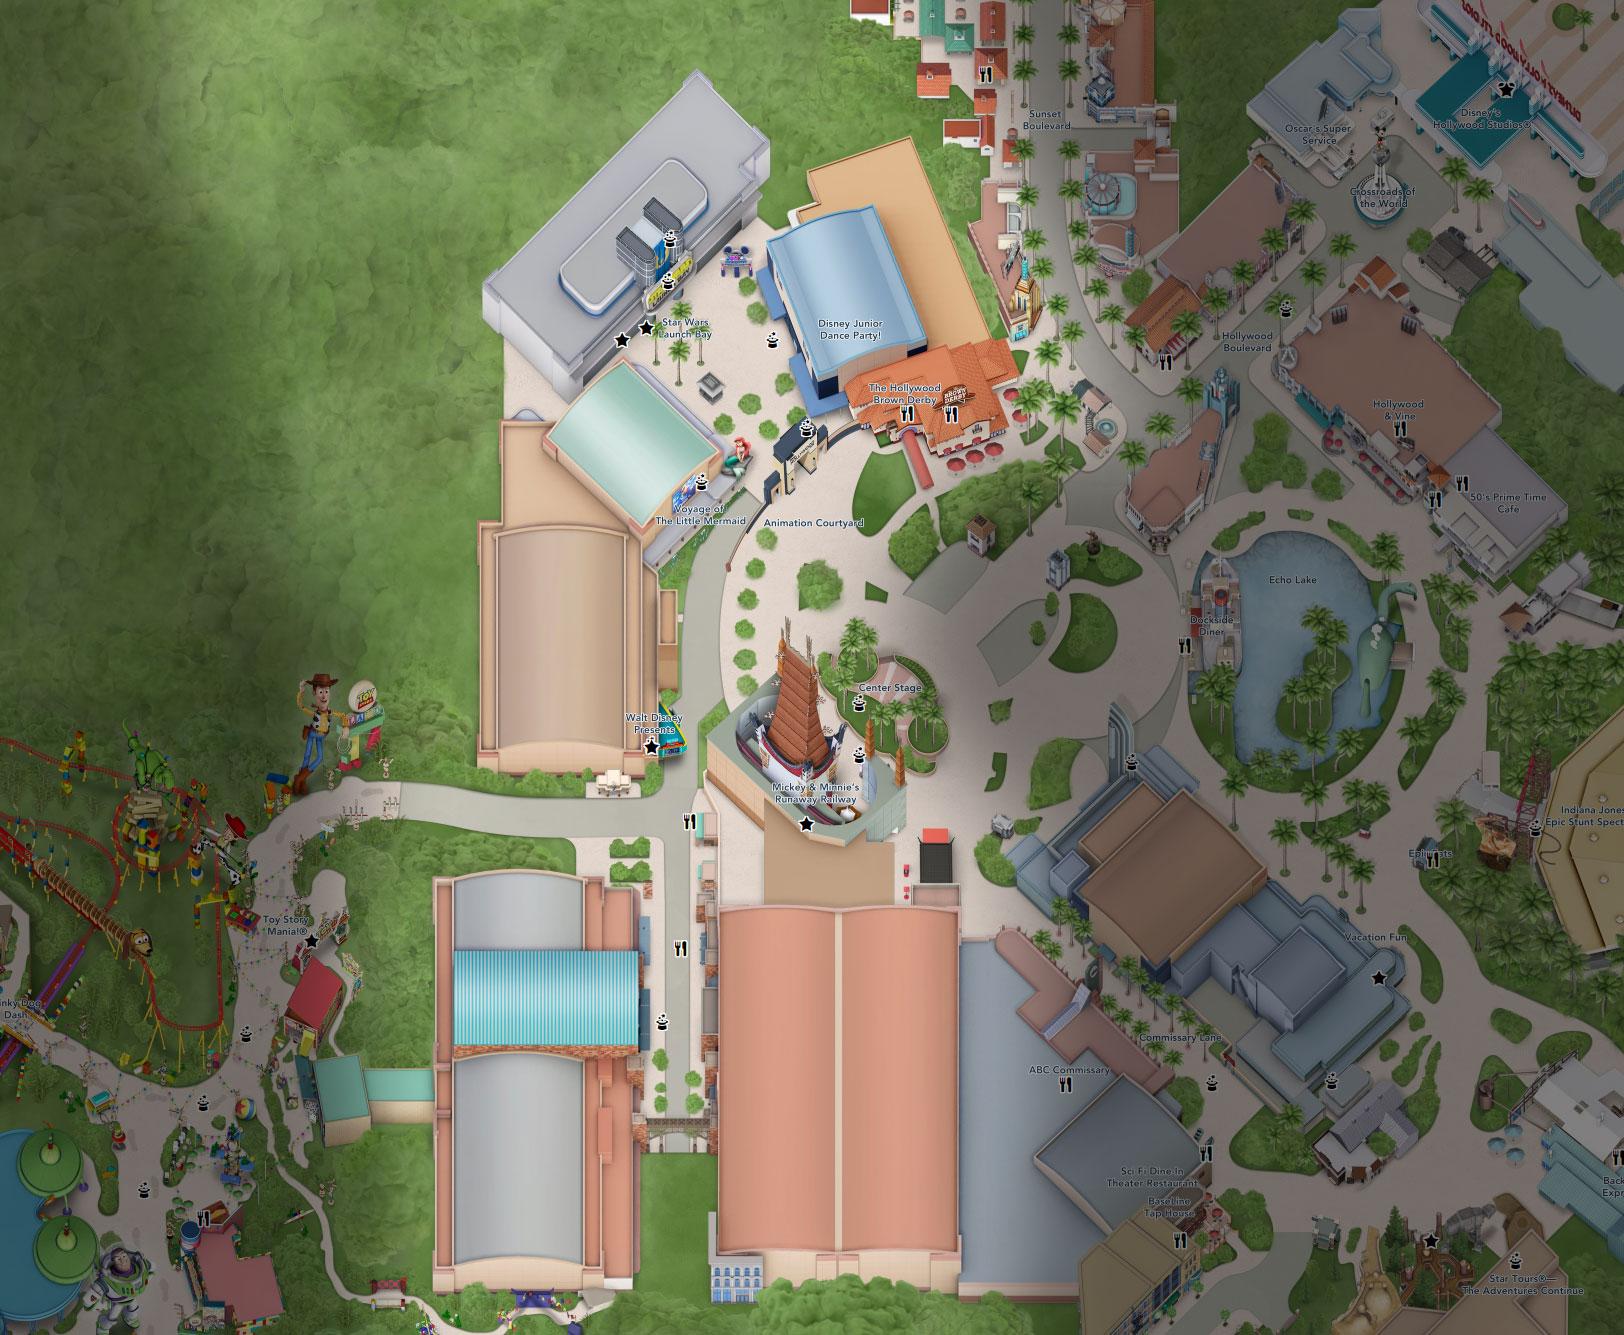 plan animation courtyard hollywood studios floride disneyland